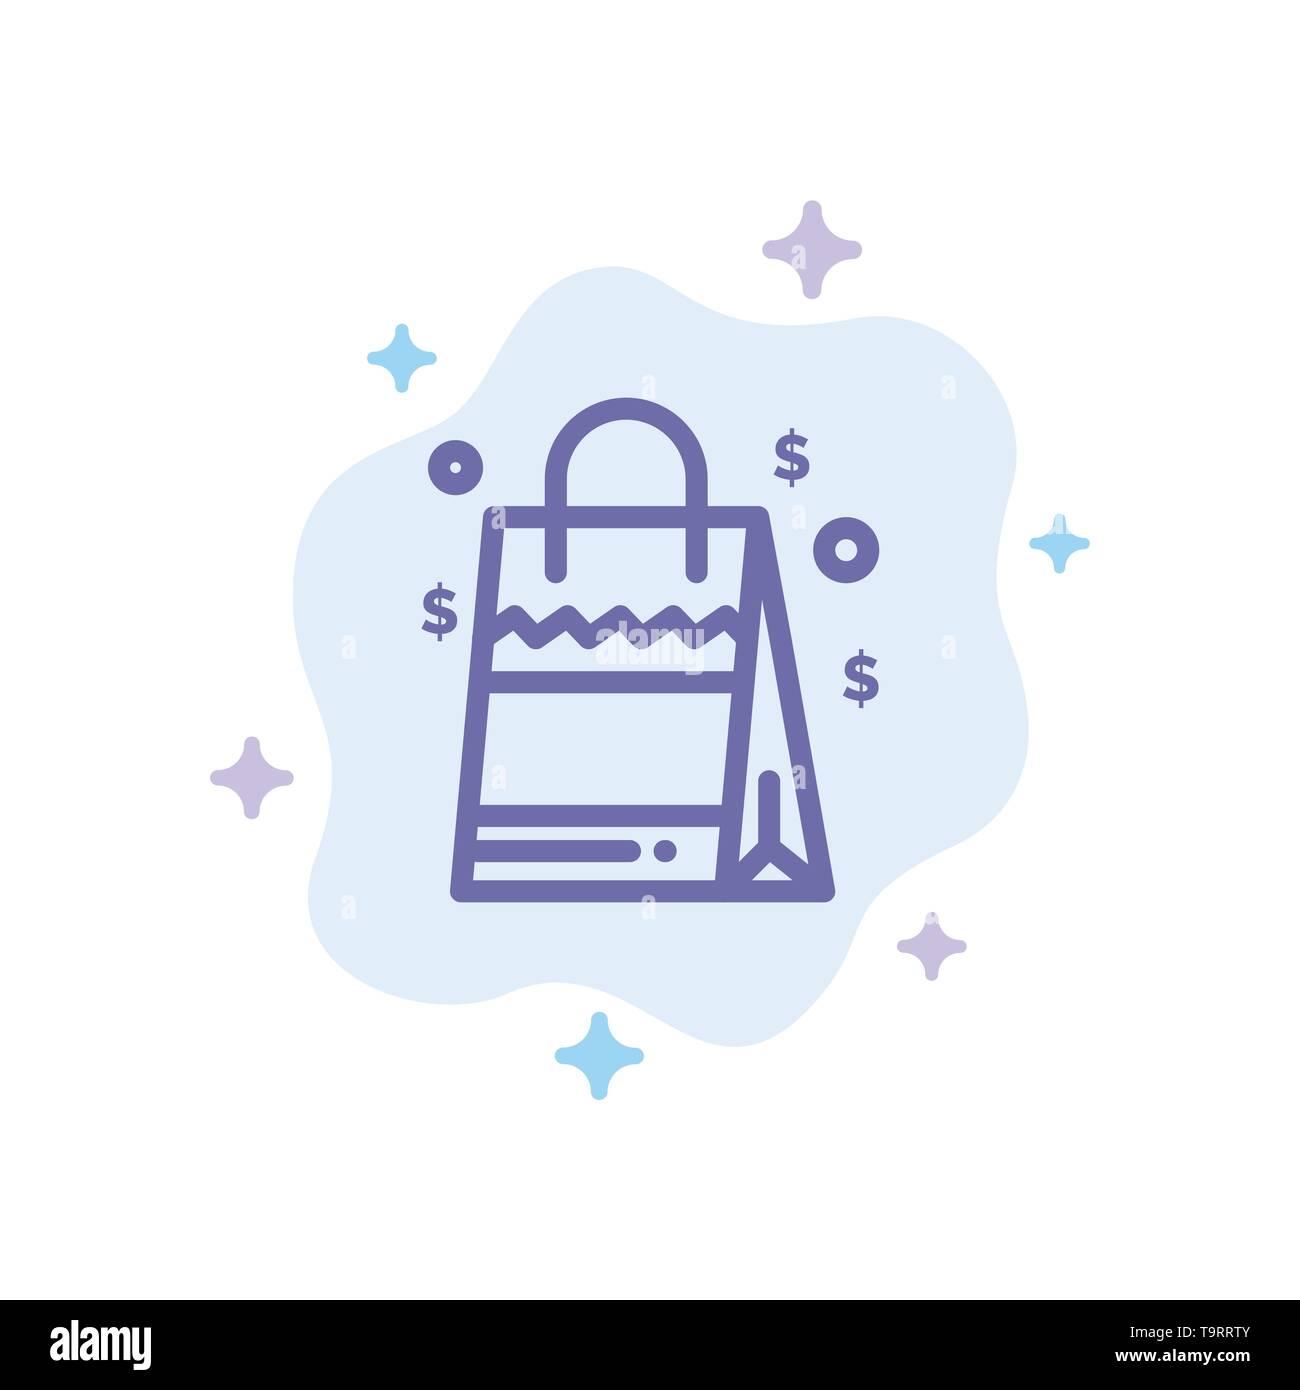 Bag, Handbag, Usa, American Blue Icon on Abstract Cloud Background - Stock Vector